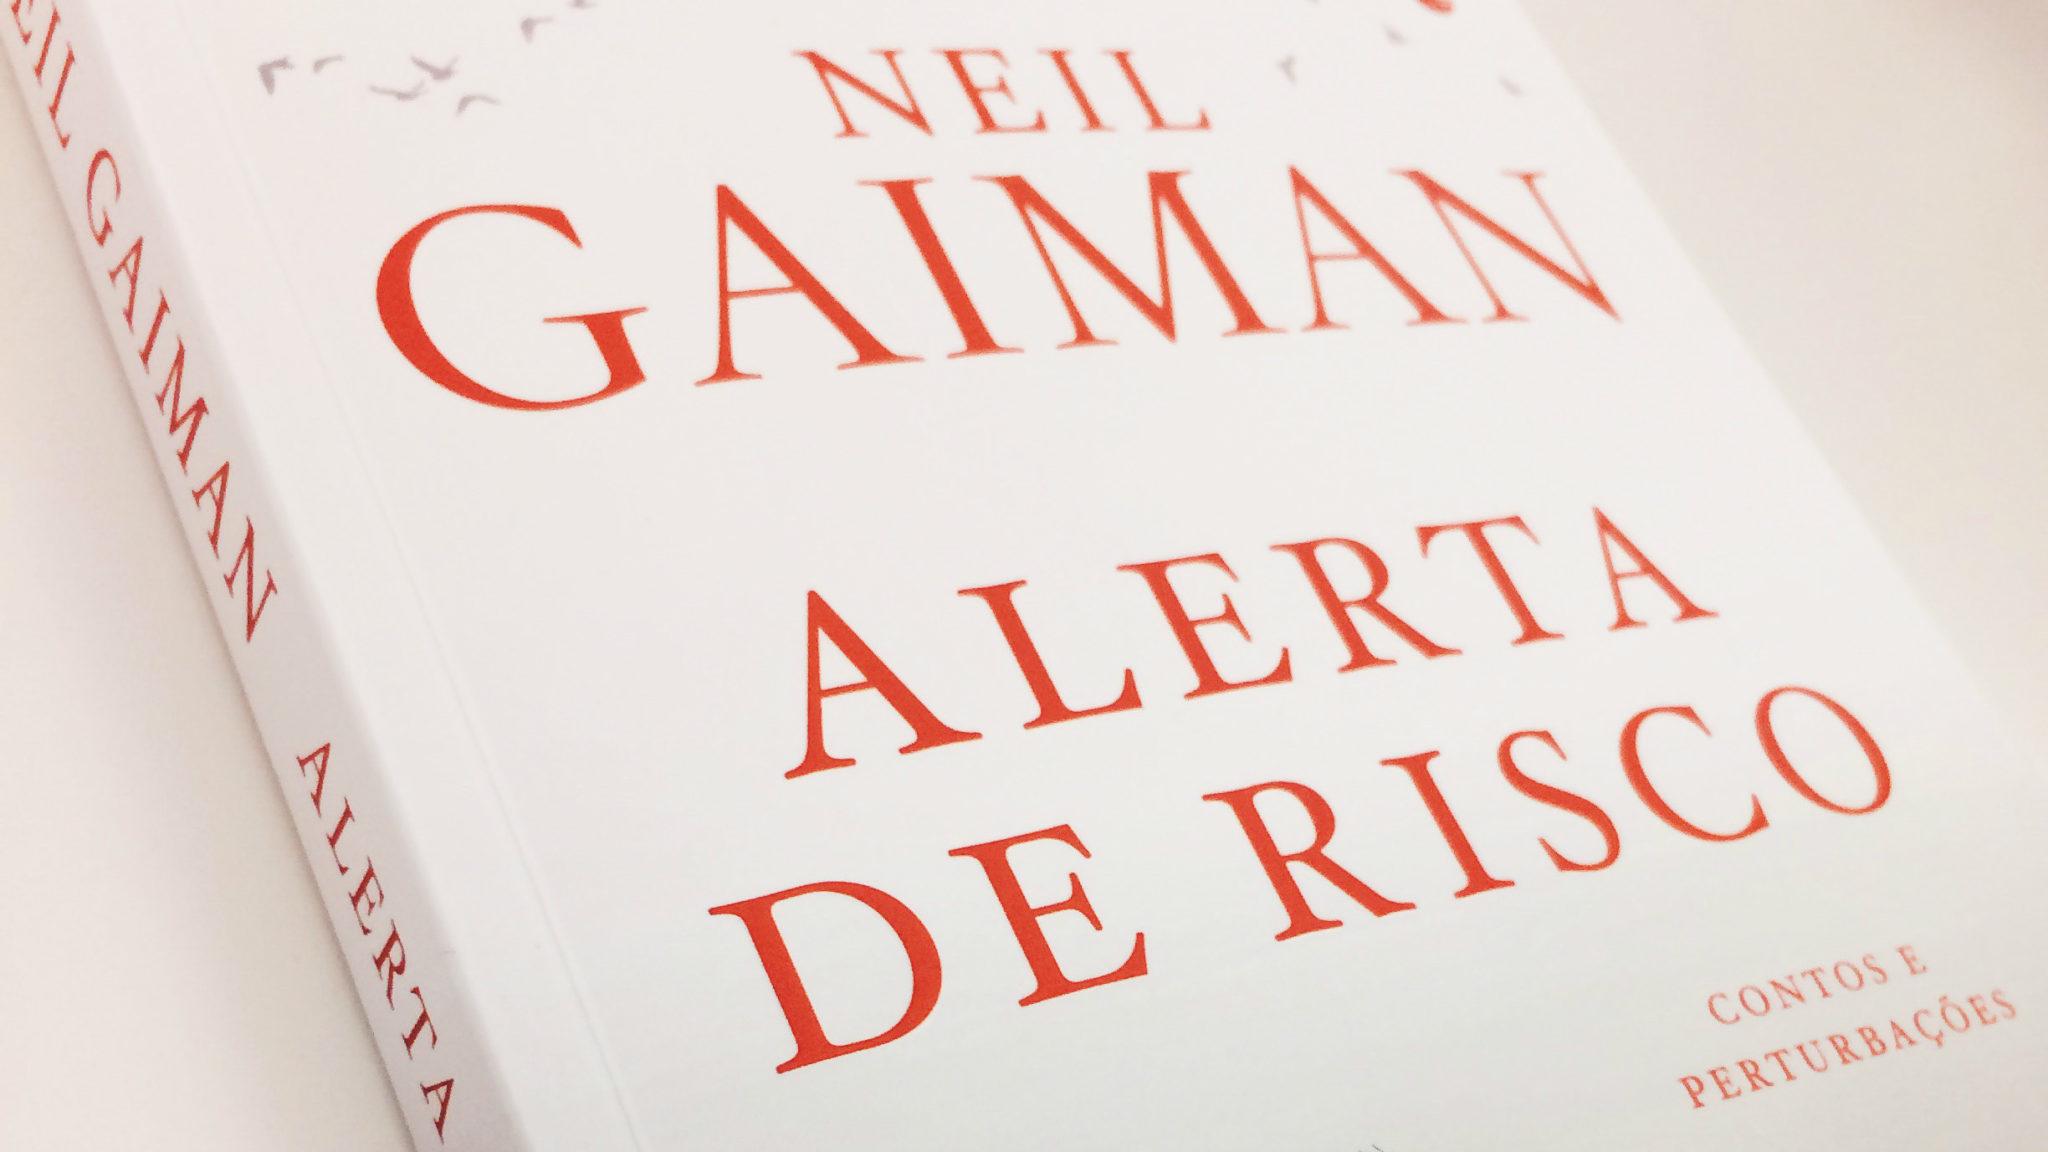 neil-gaiman-alerta-de-risco-resenha-intrinseca-01